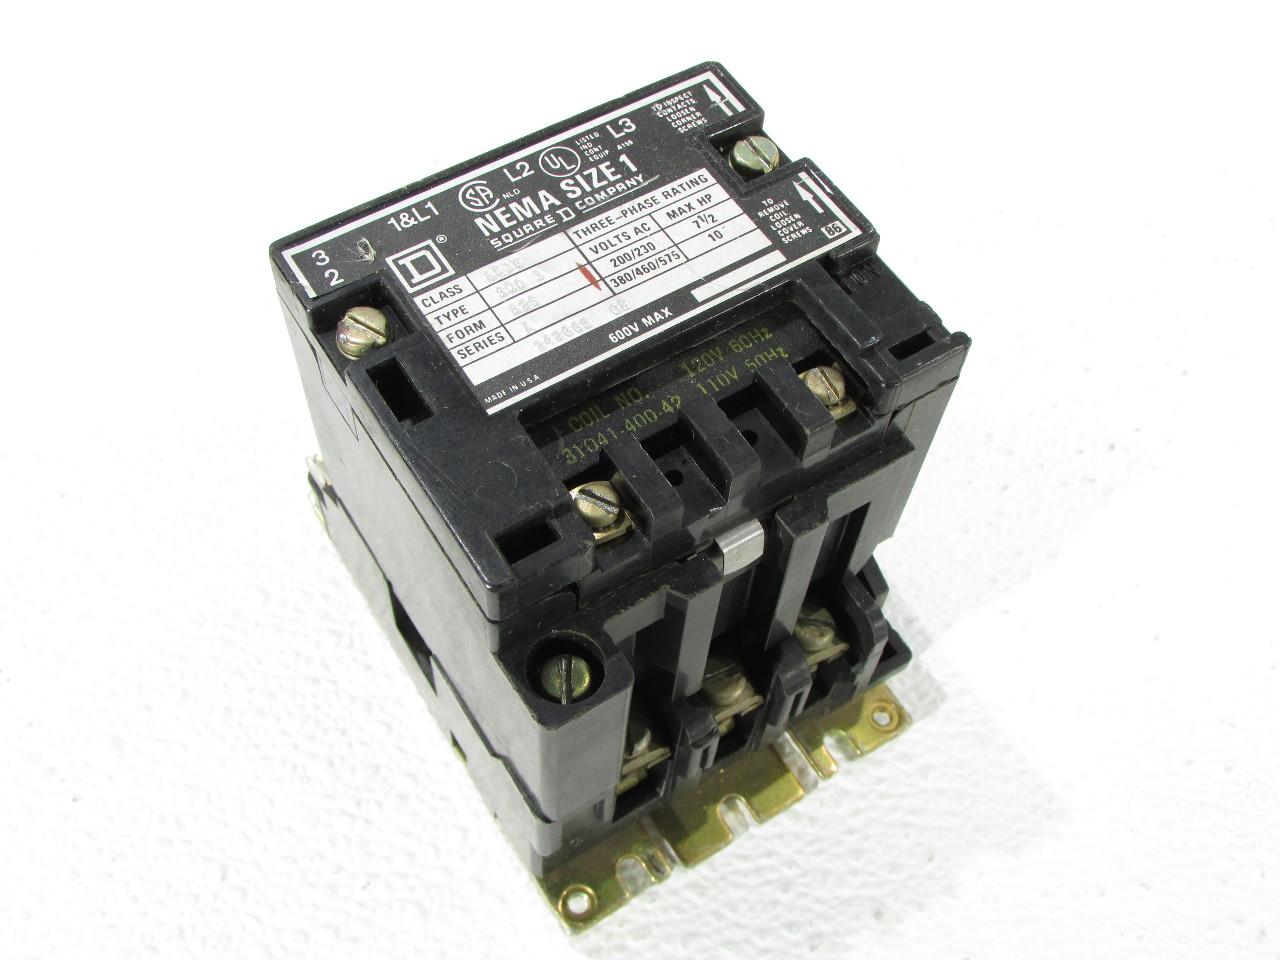 Square D Nema 8536 Size 1 Motor Starter Premier